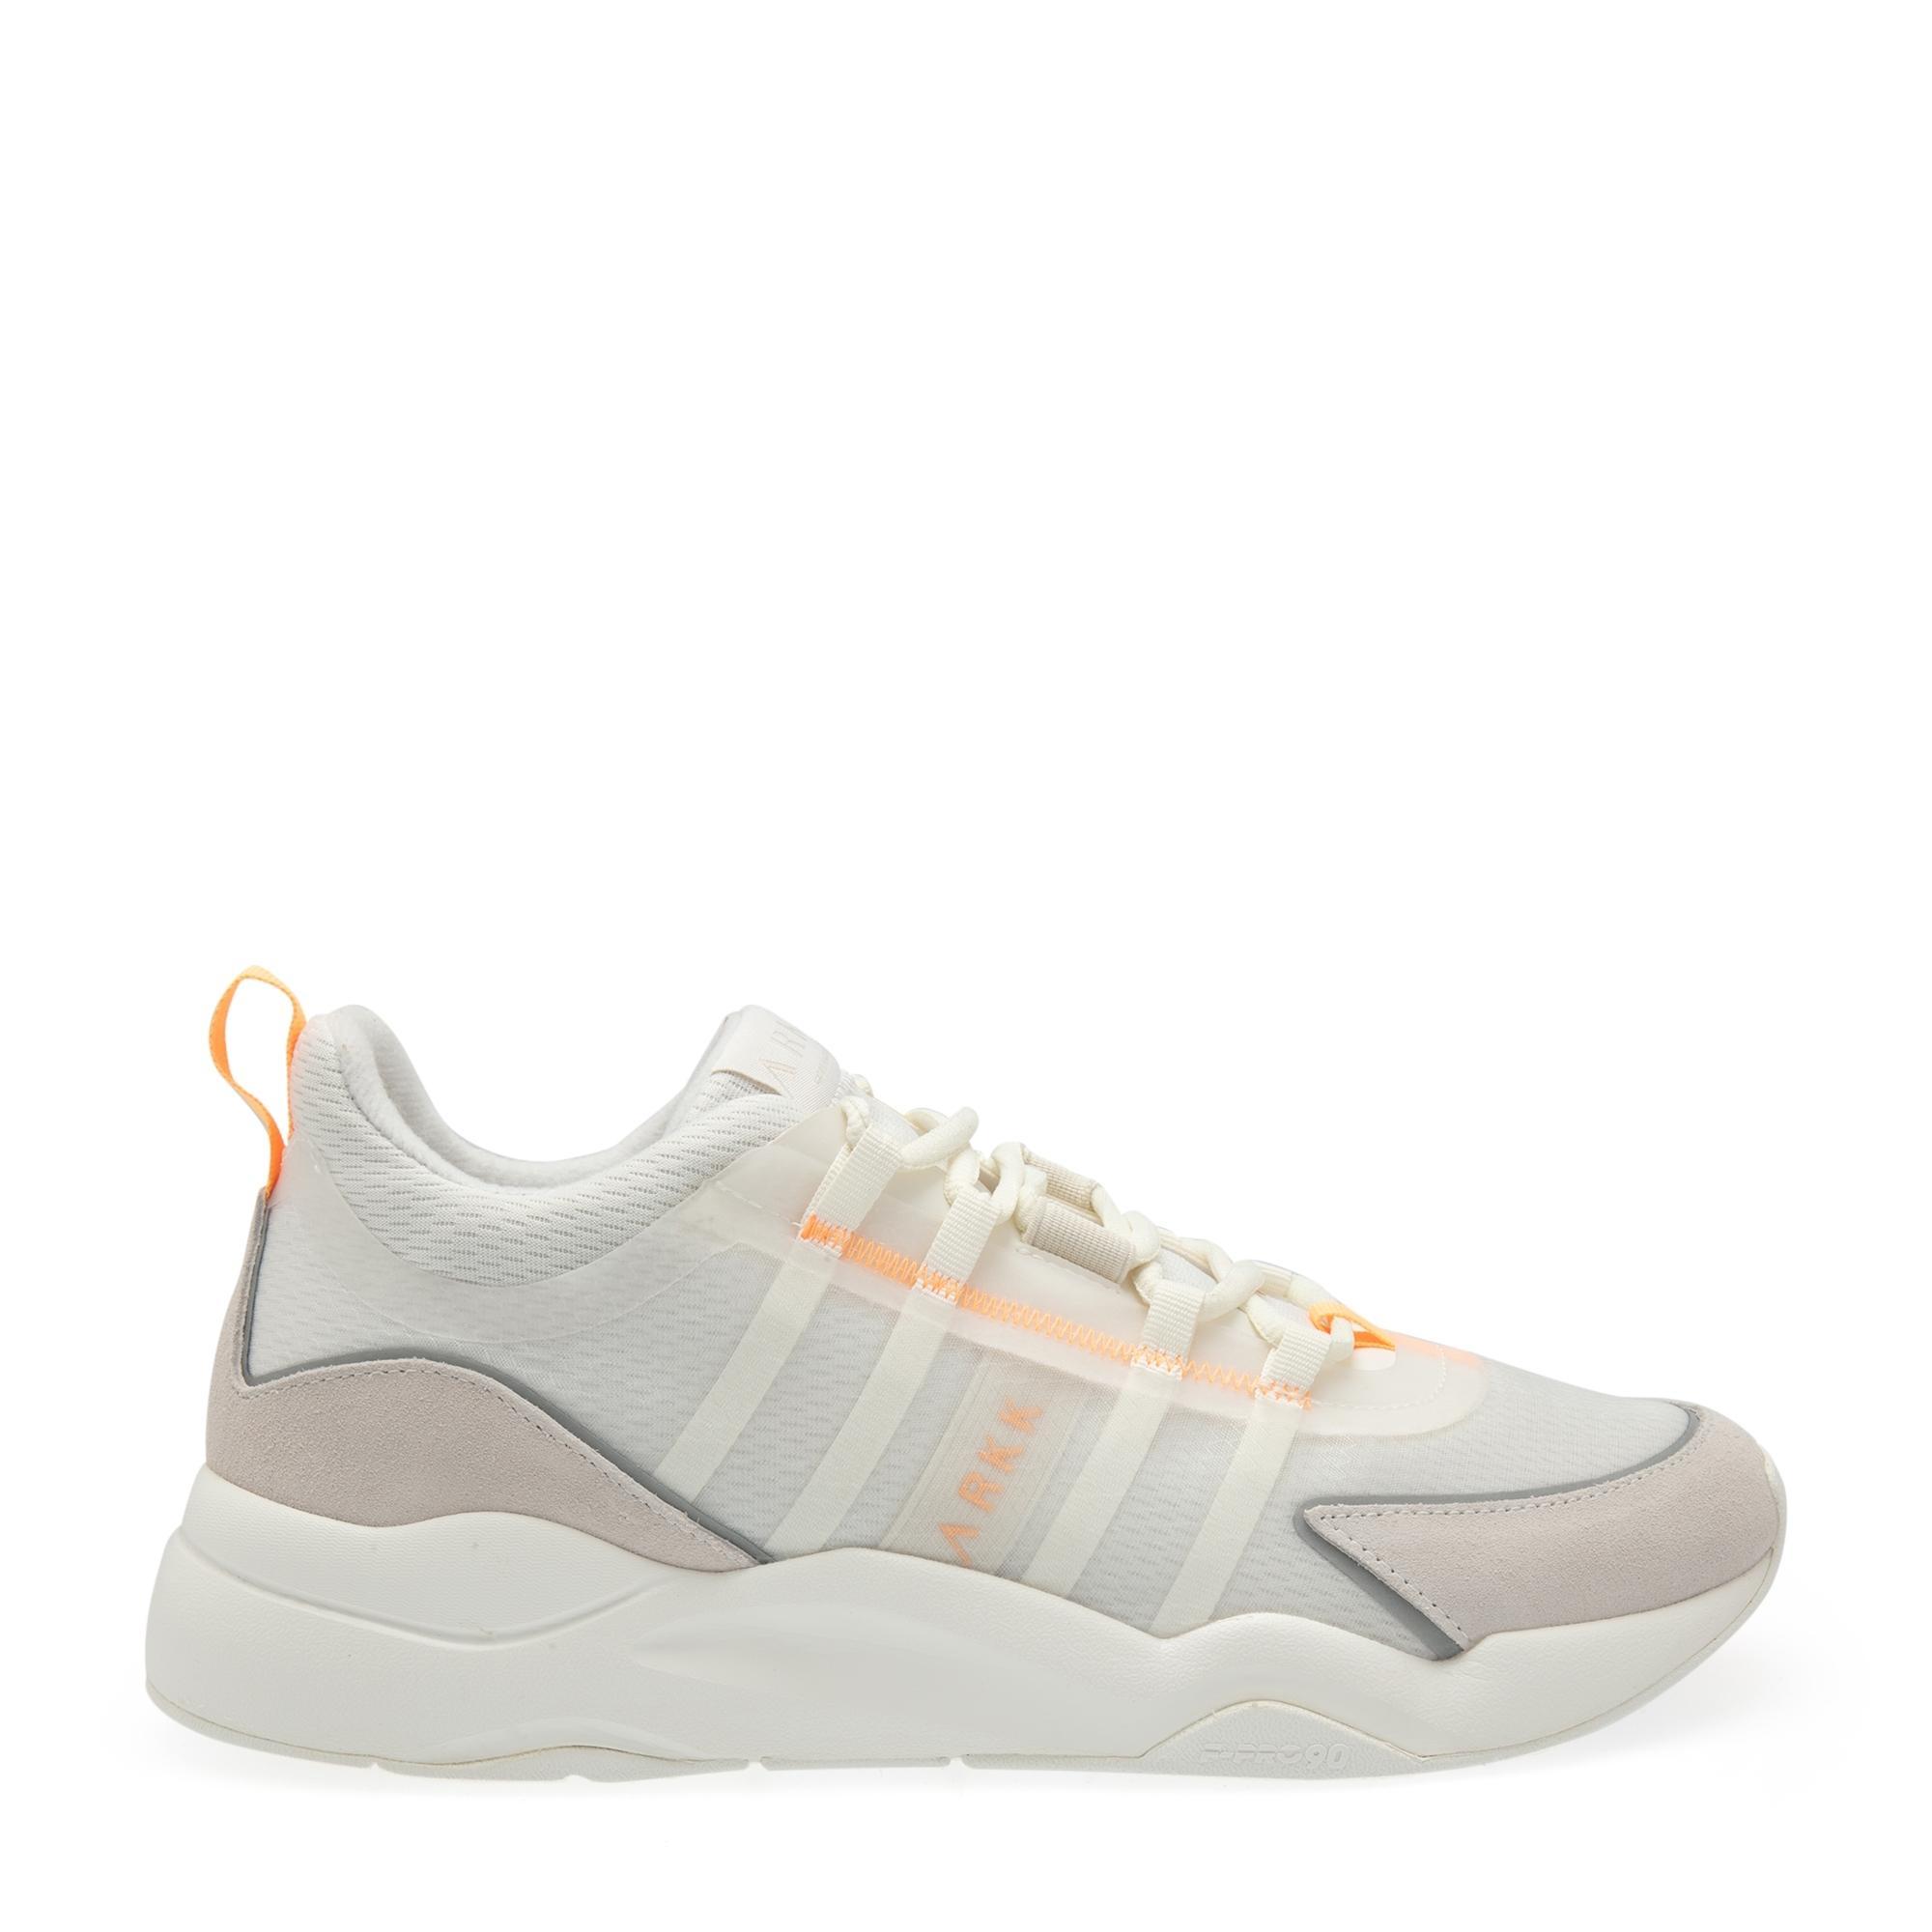 Lyron mesh sneakers